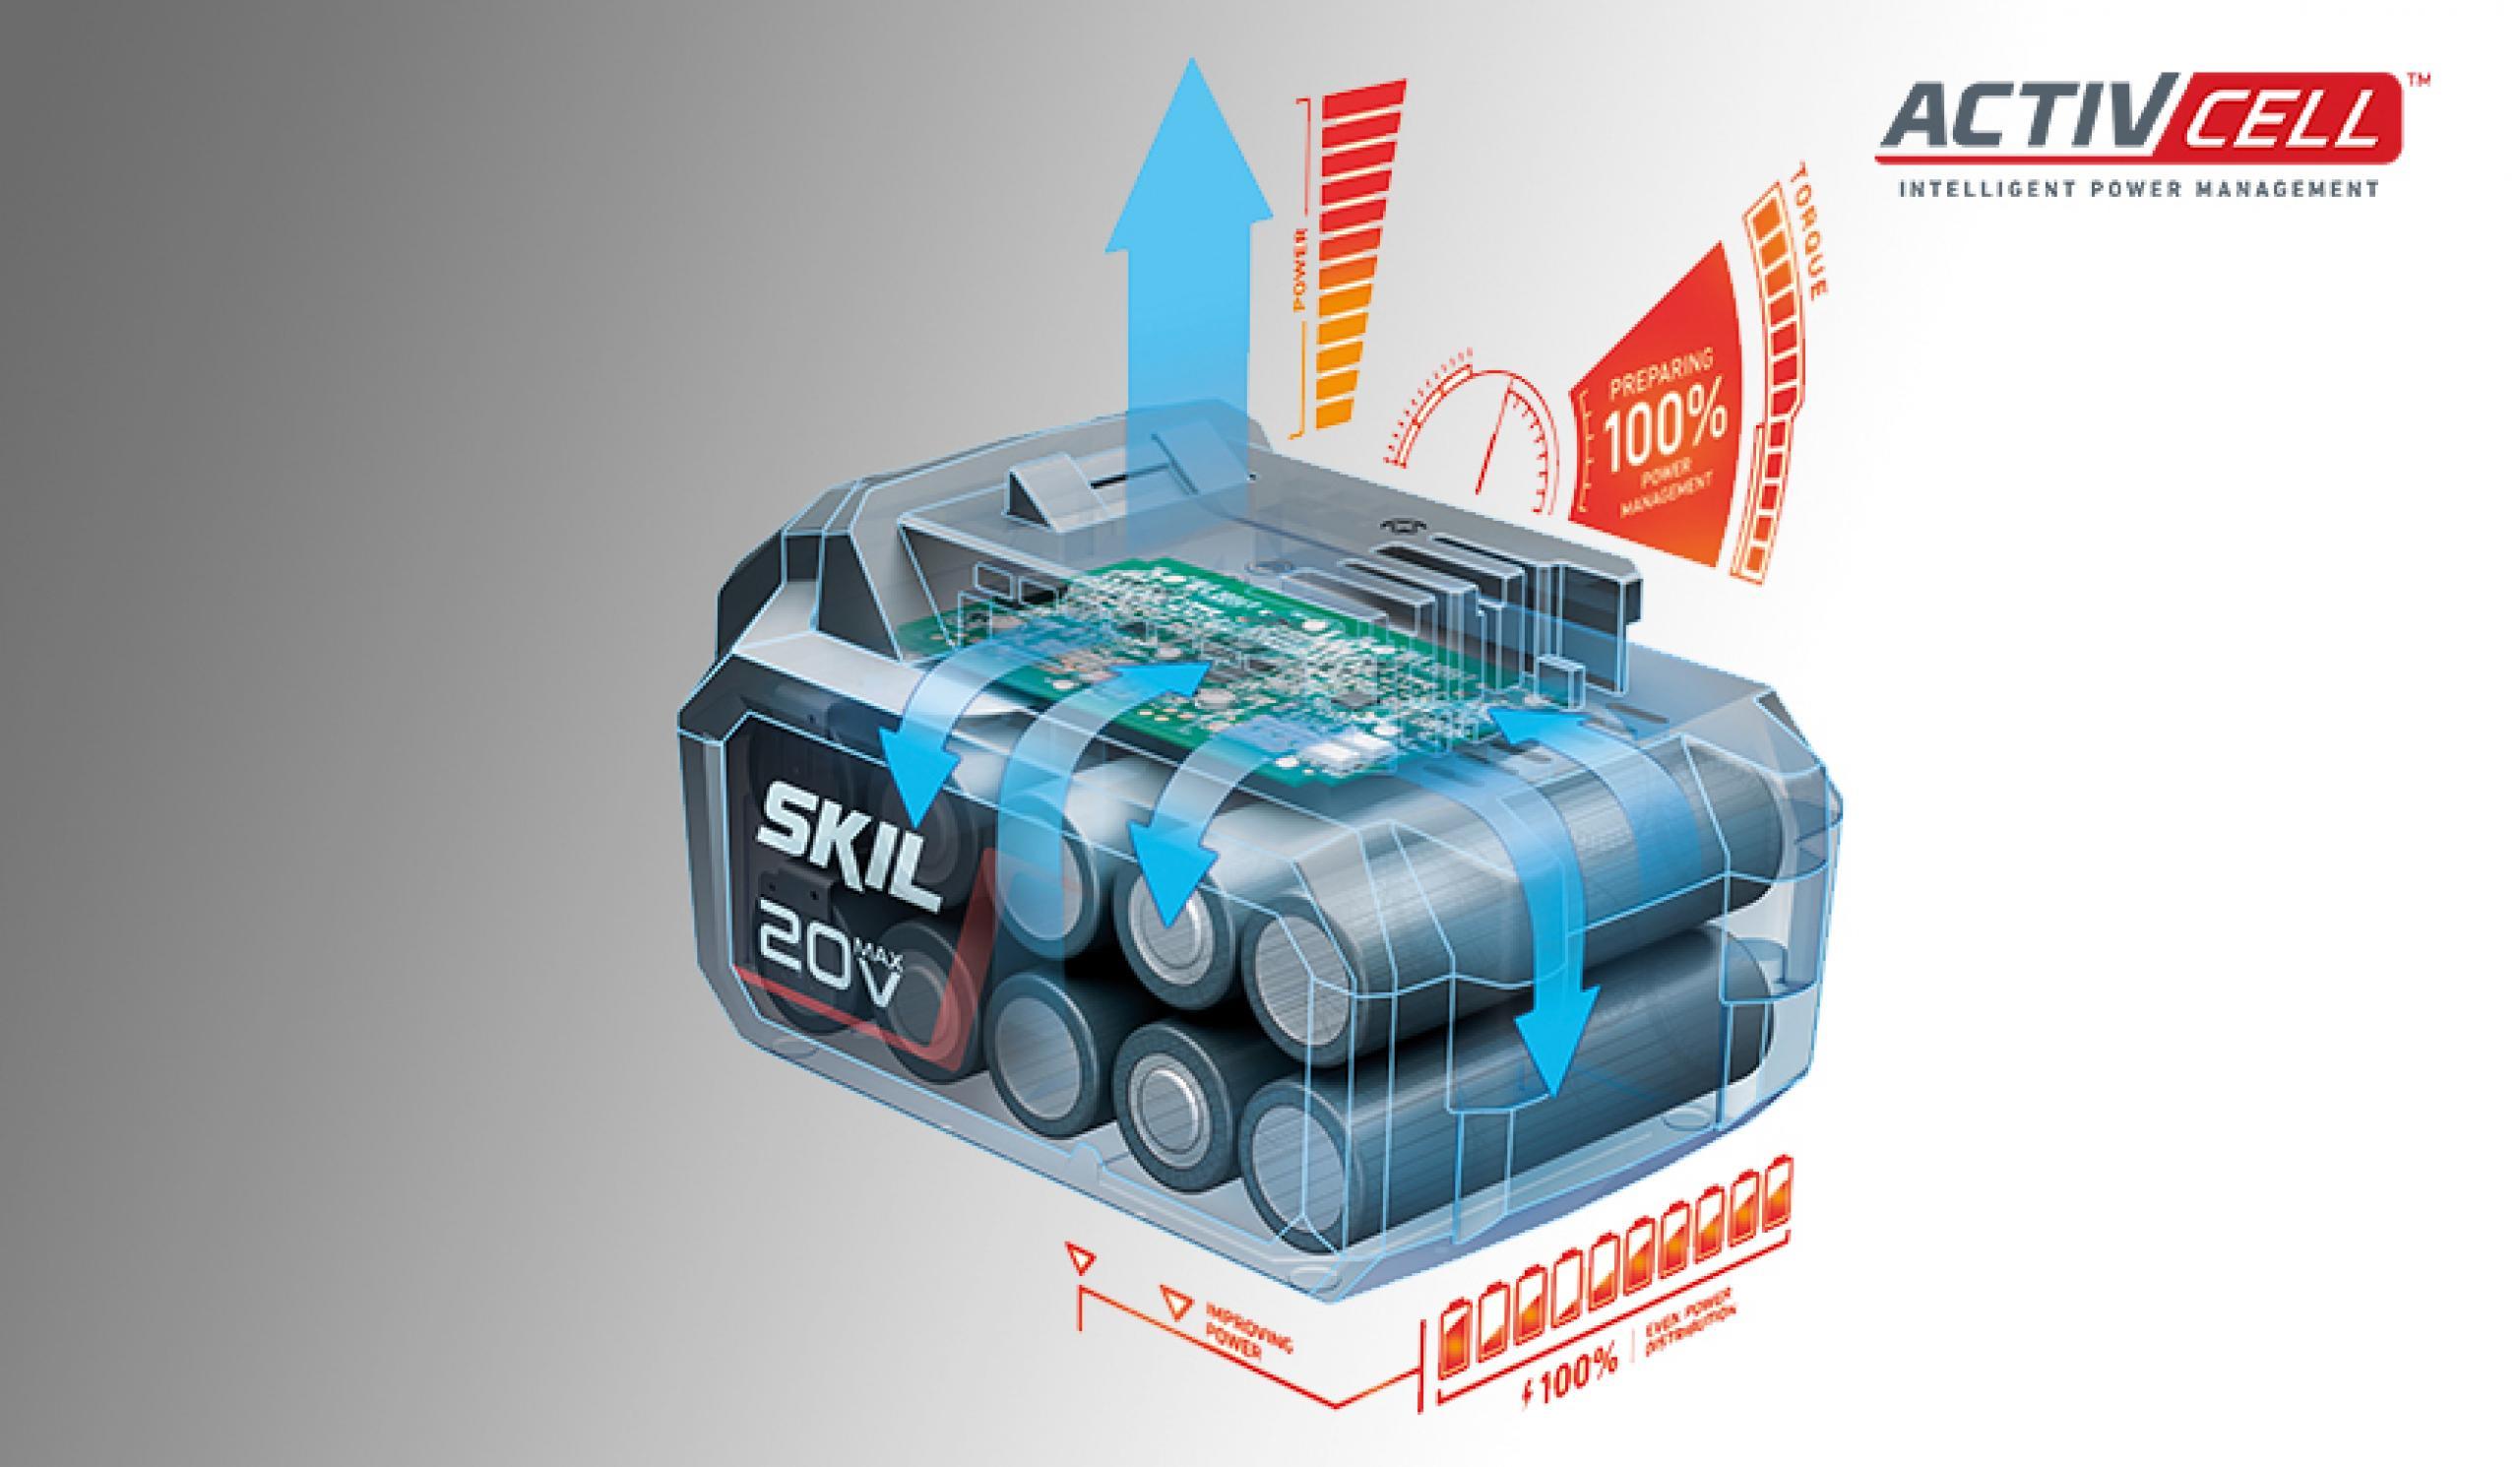 ActivCell™: Pametno upravljanje snagom